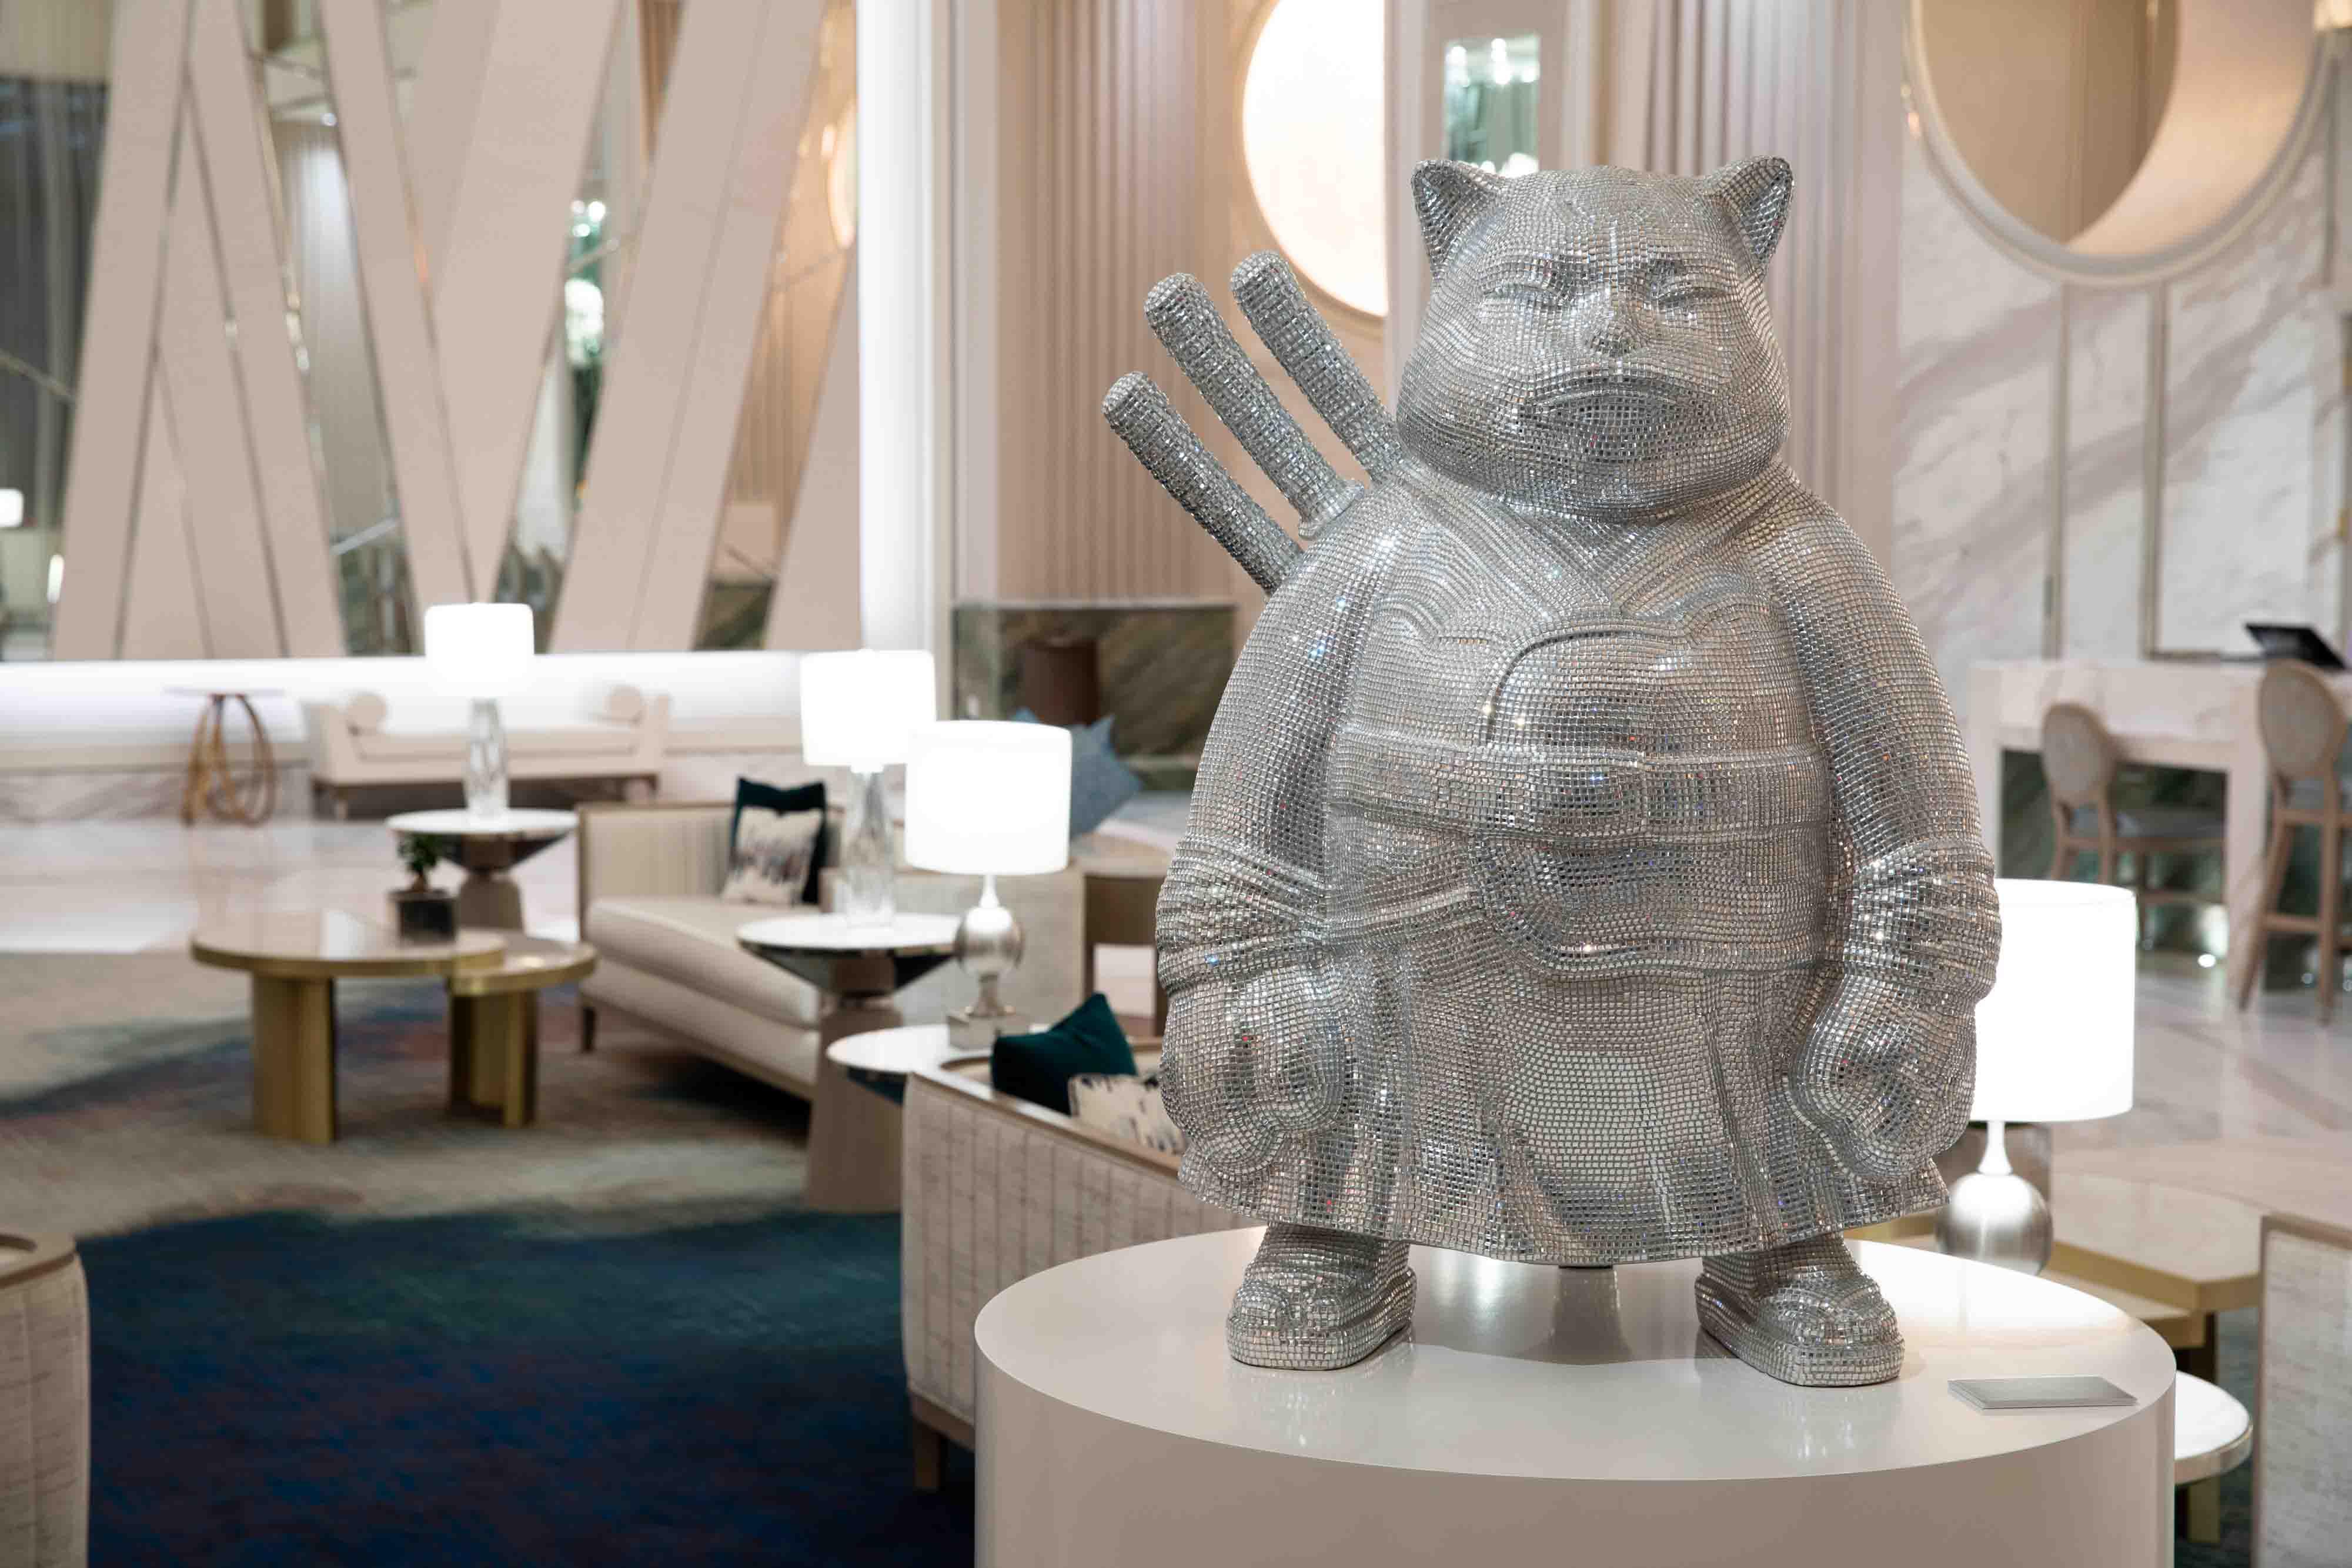 Resorts-world-art-vegas